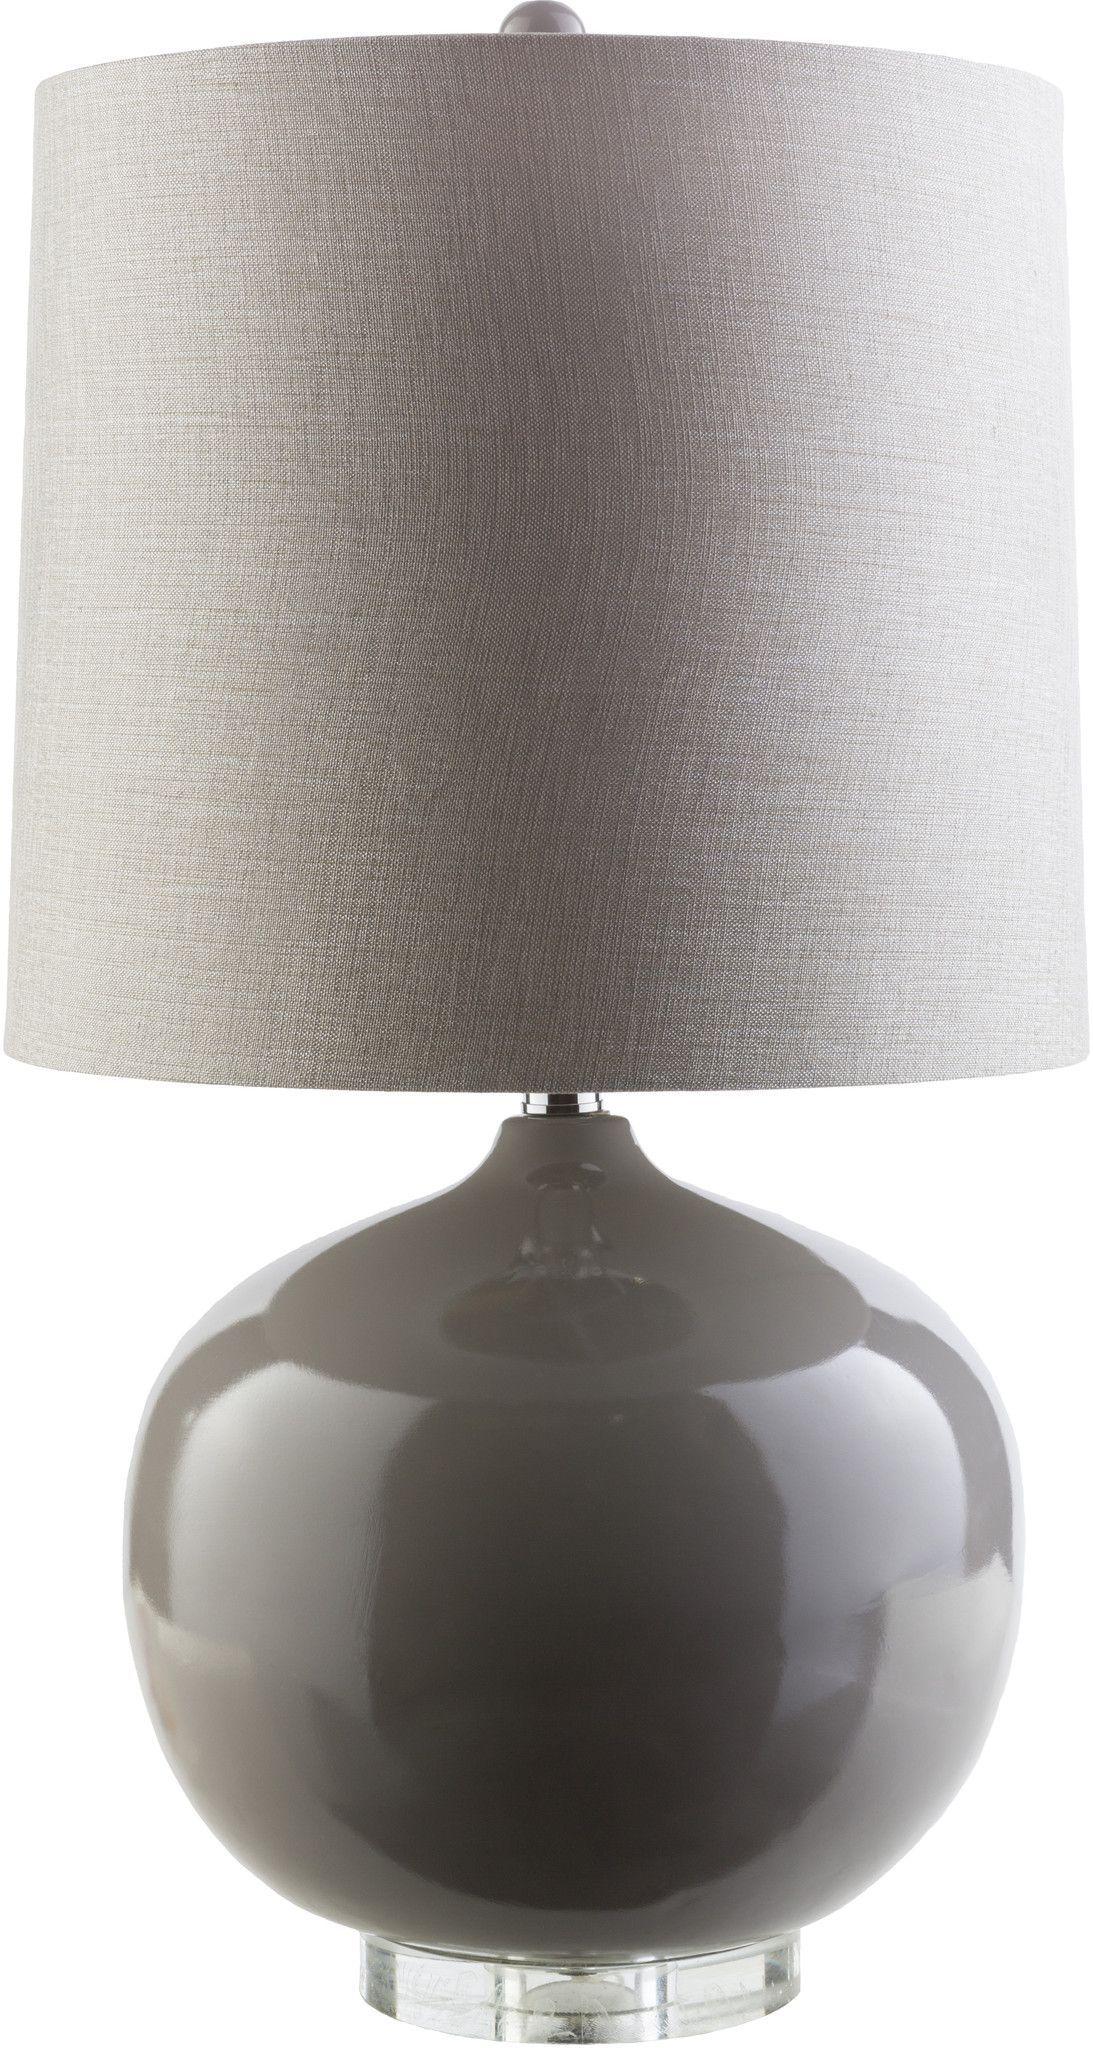 Lamp Modern Floor Lamp Gray Acrylic ivory